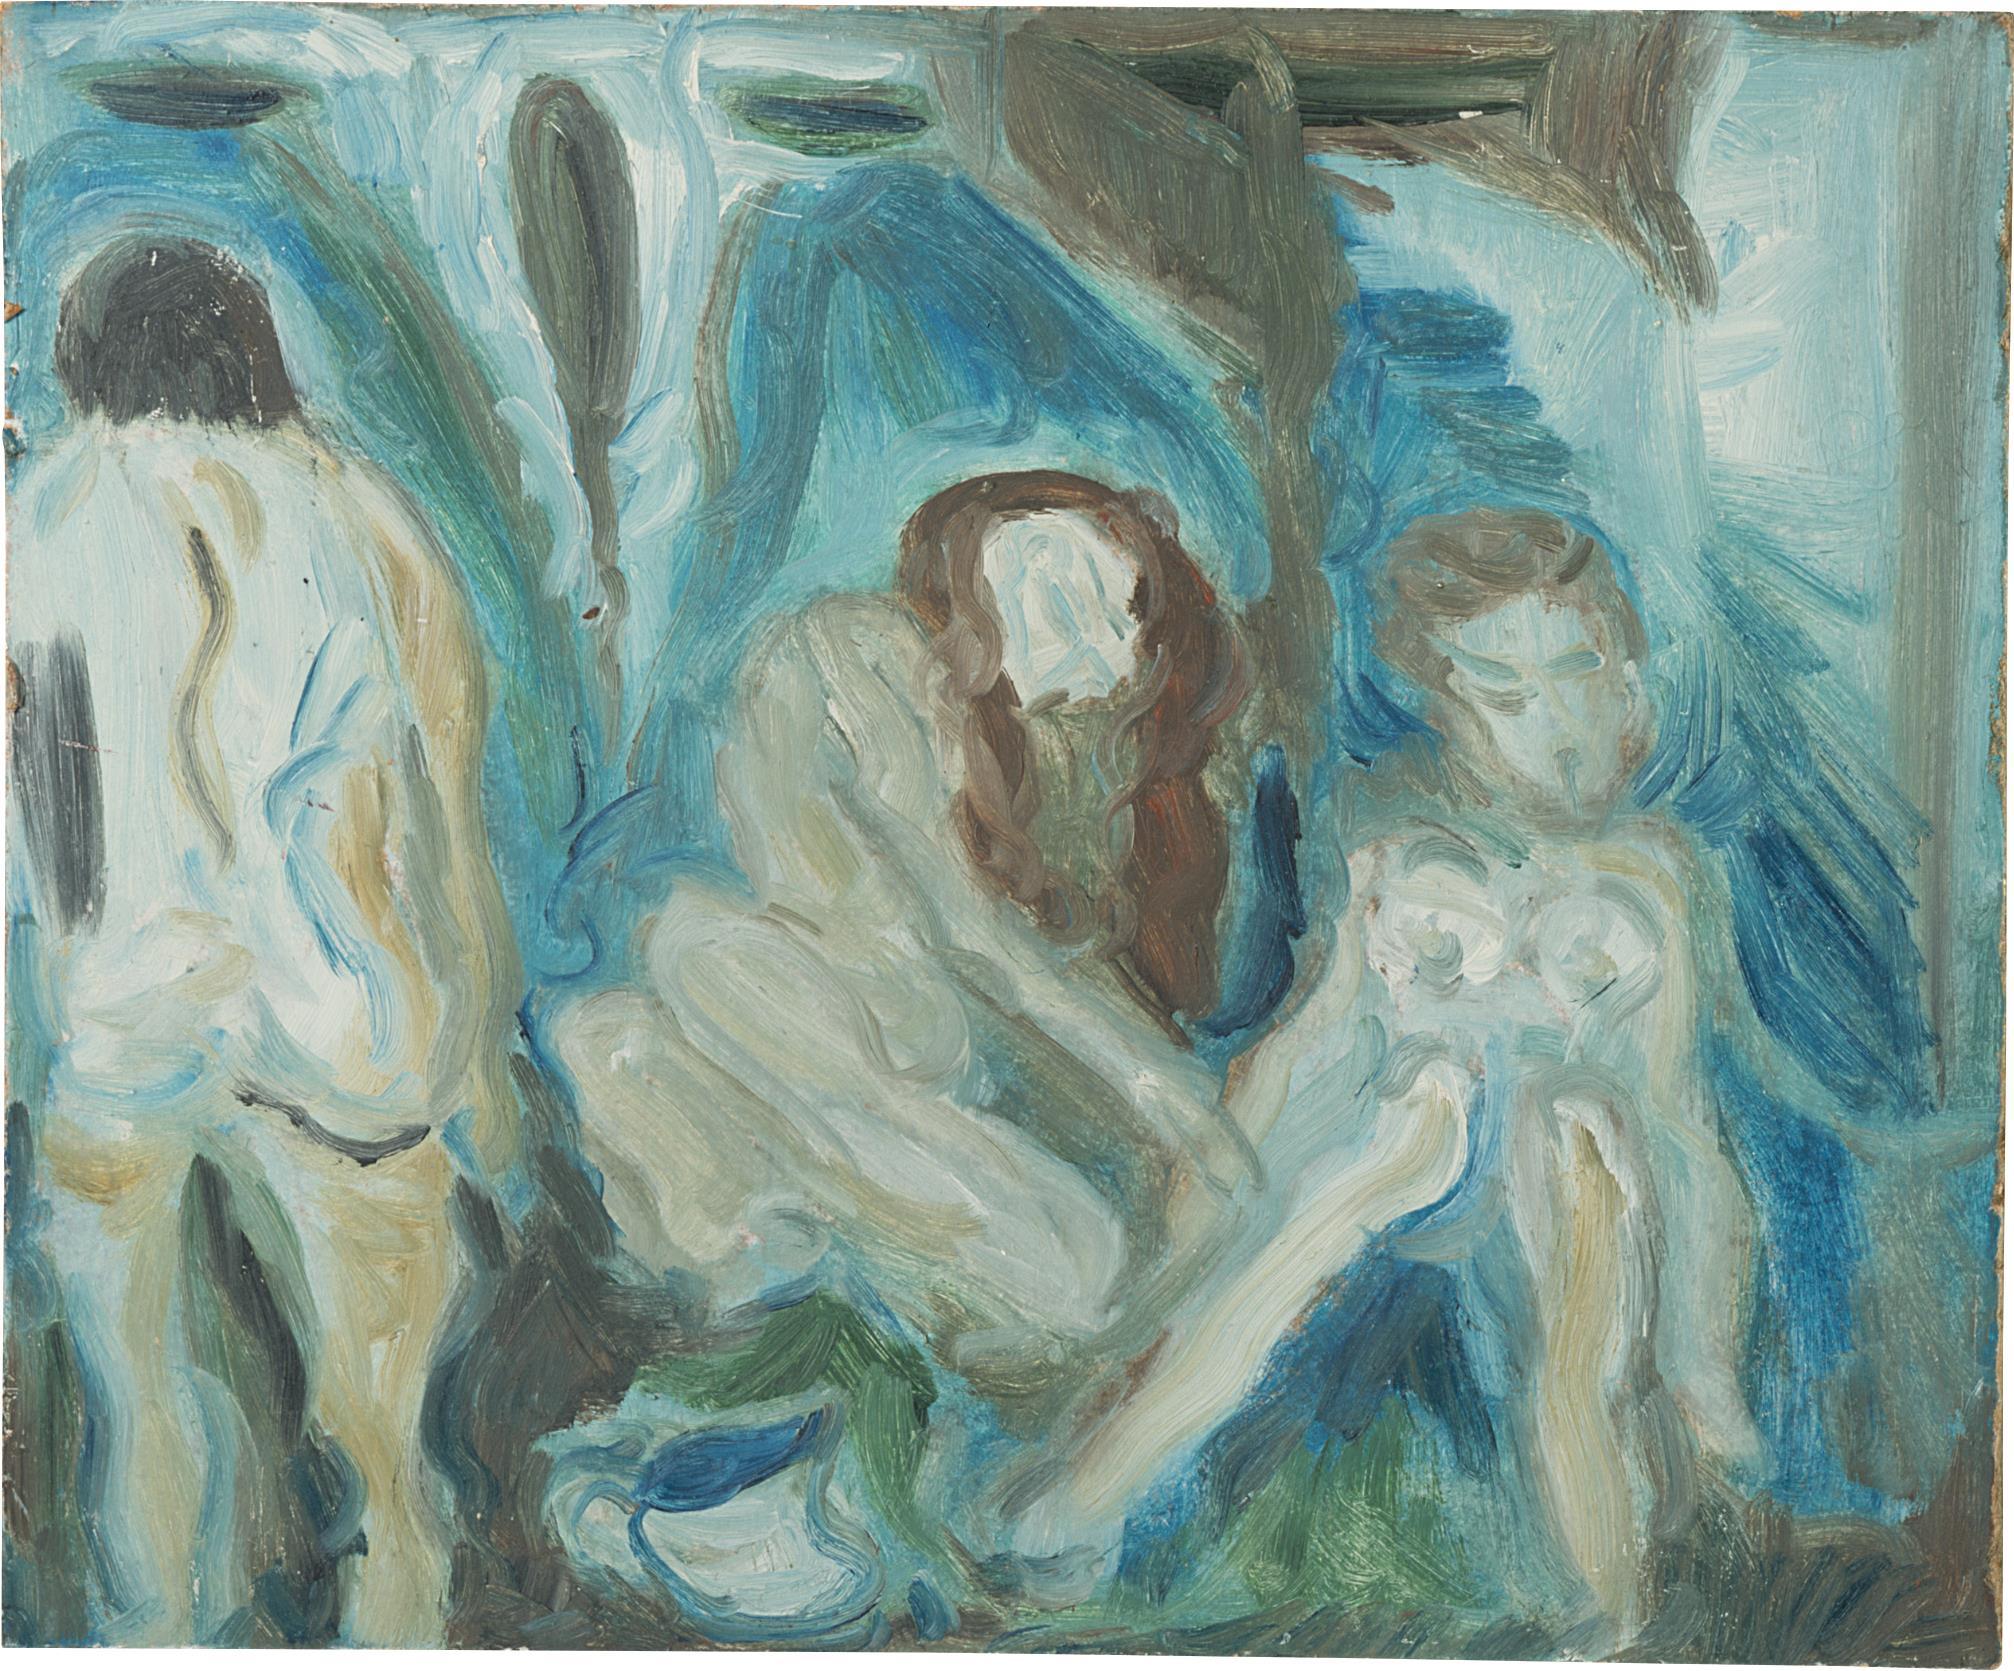 Tracey Emin-Untitled (Porchester Baths)-1988